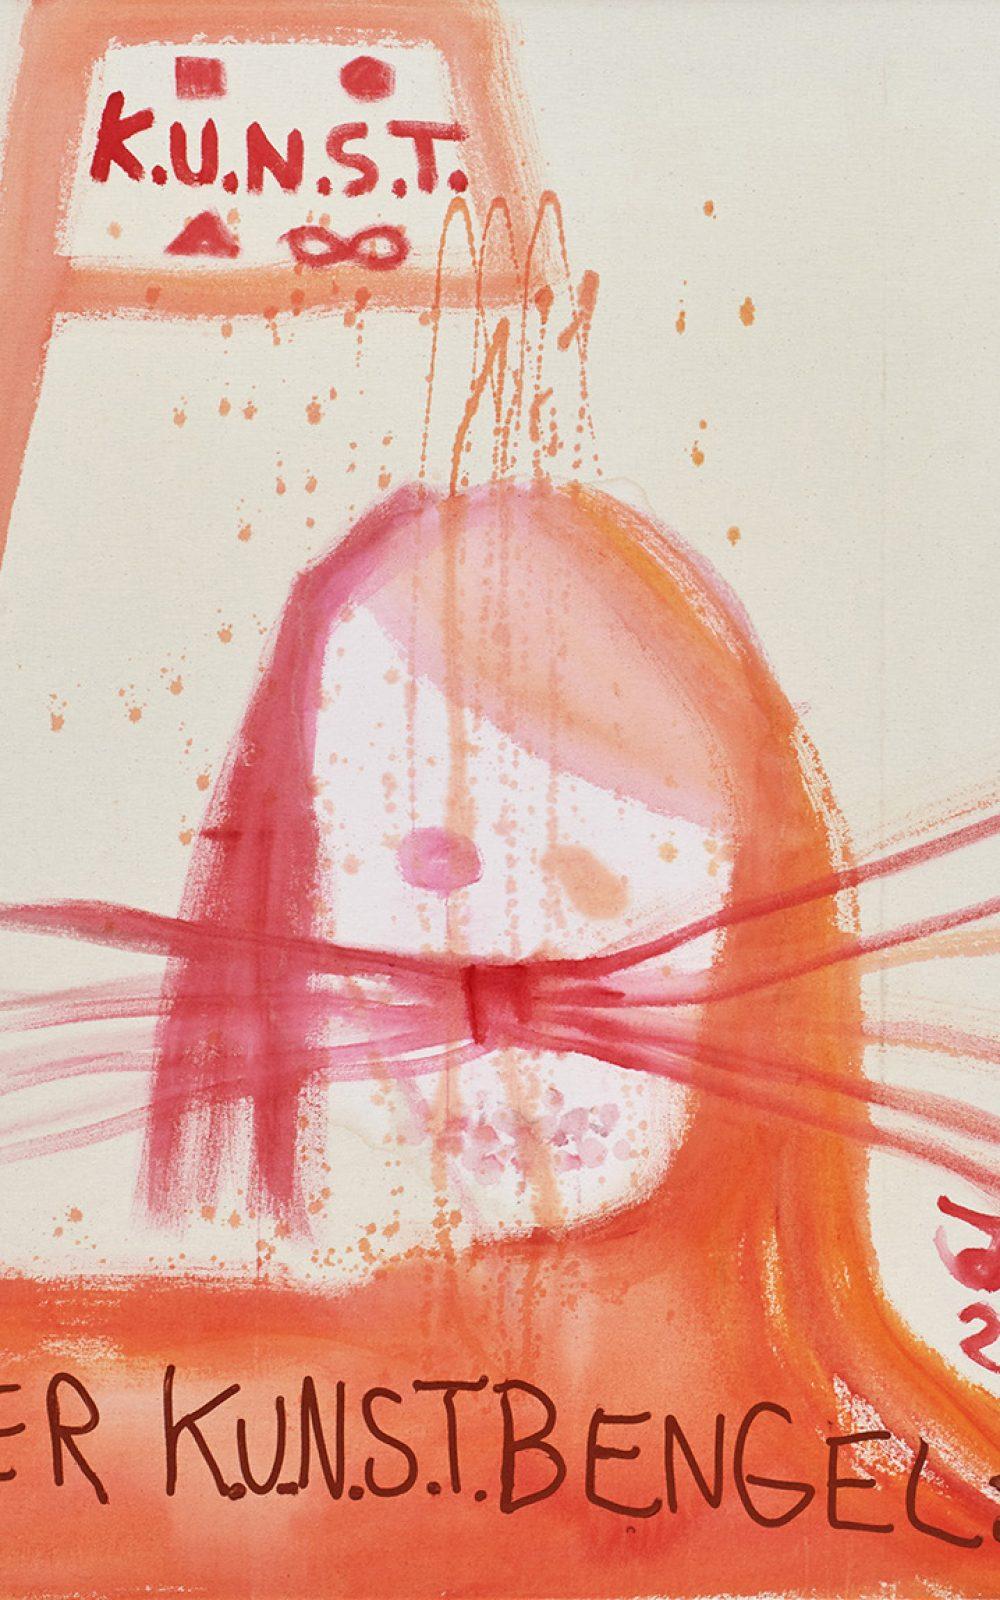 "Jonathan Meese, ""CHEF DE KUNST"" SAGT: KUNST IST DE CHEF!"", Acryl auf Nesse, 120,5 x 100,3 x 3,3 cm, 2017 © Photography Jan Bauer . Net | Courtesy Jonathan Meese . Com © Jonathan Meese /VG Bild-Kunst, Bonn 2018"